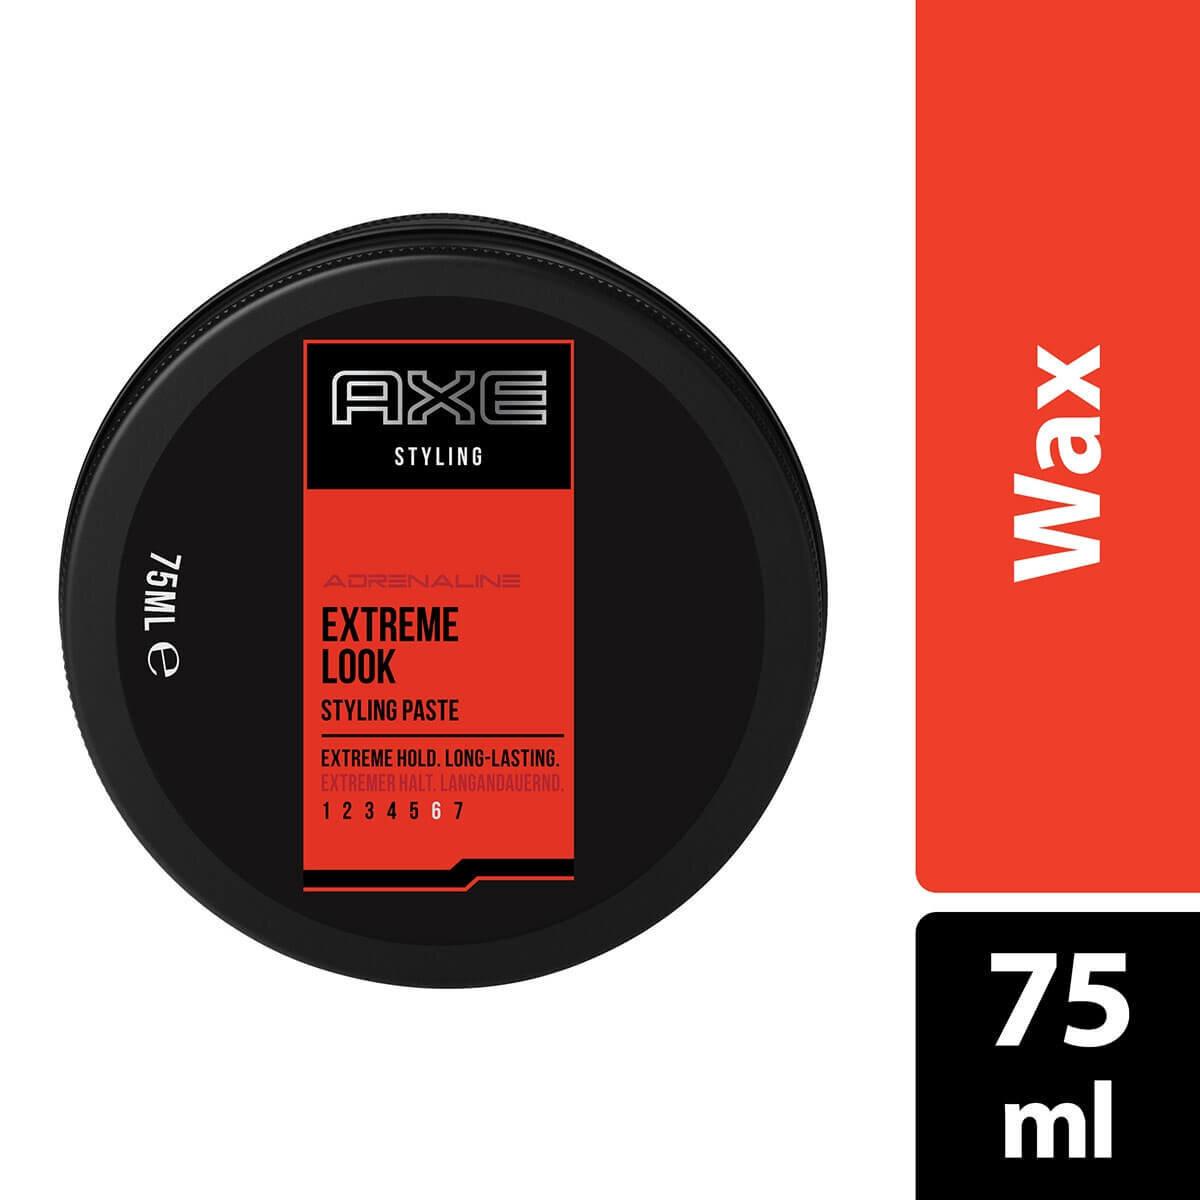 Wax Adrenaline Extreme Look 75ml